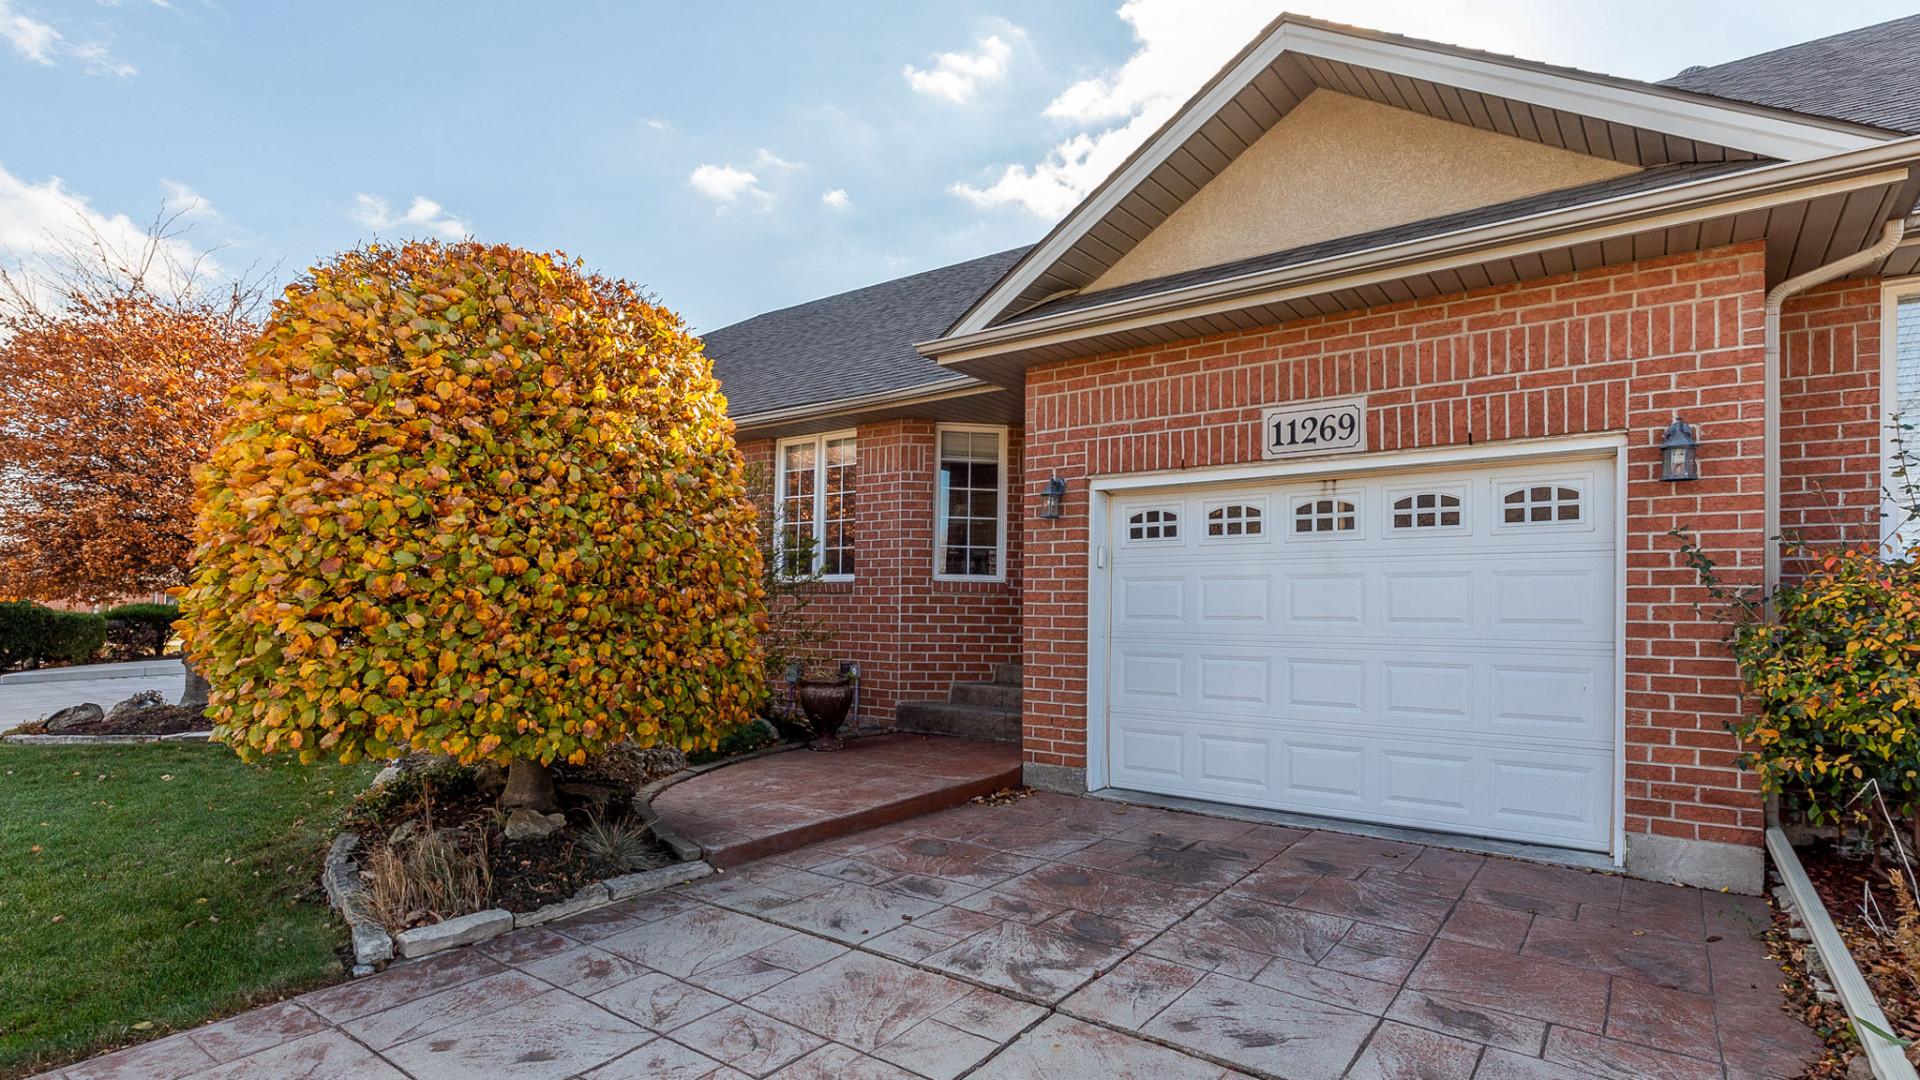 11269 Firgrove Drive, Windsor – $299,900